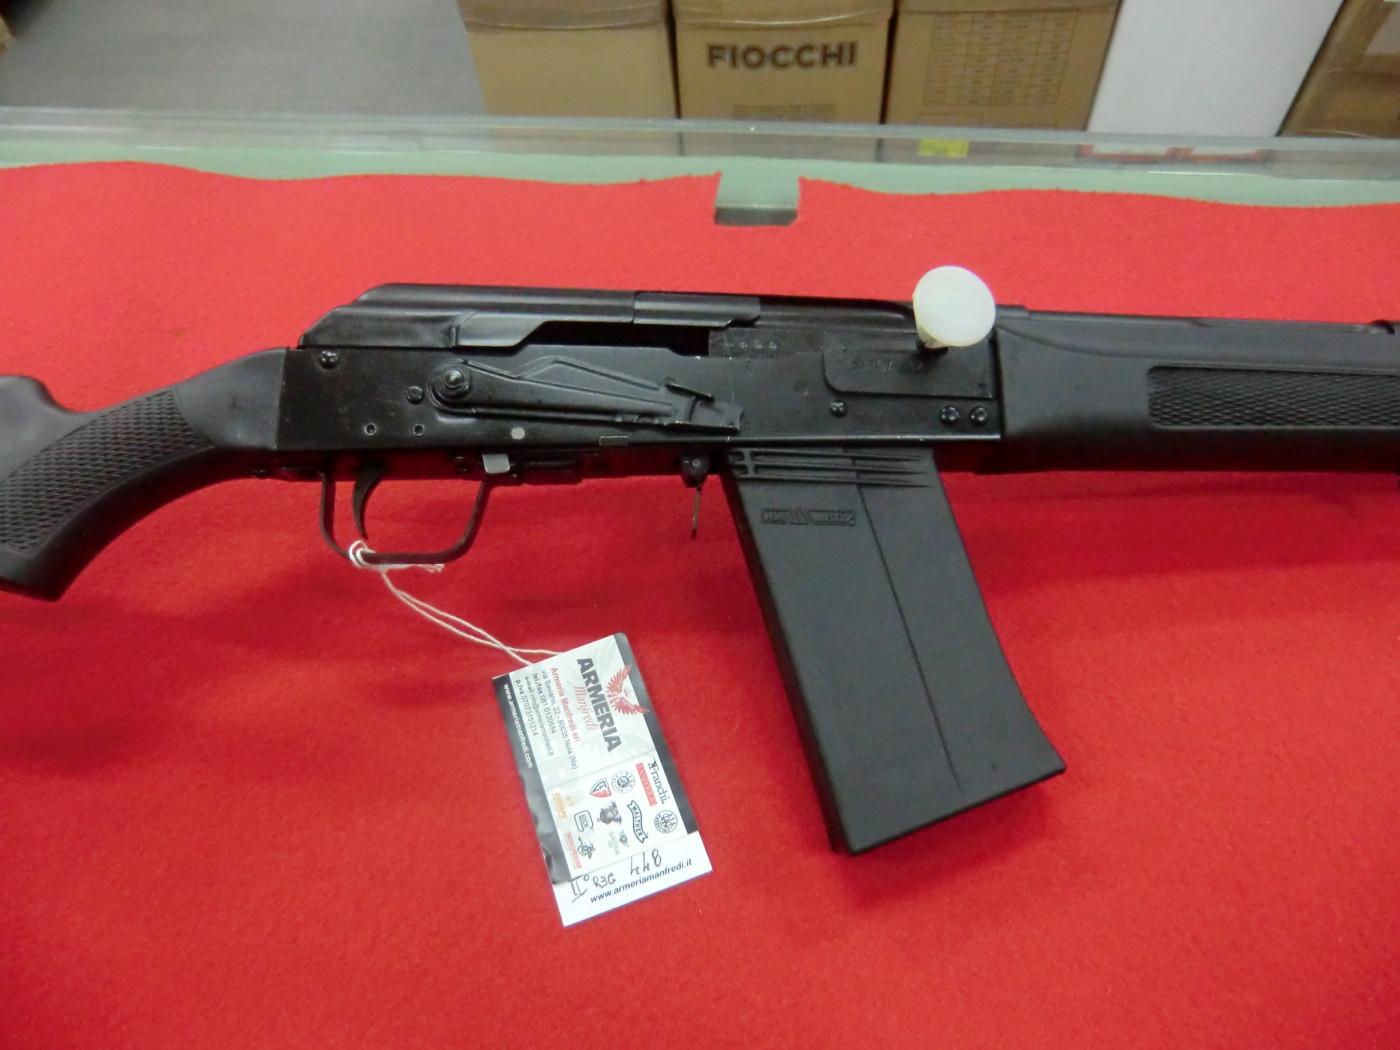 Izhmash modello Saiga calibro 12